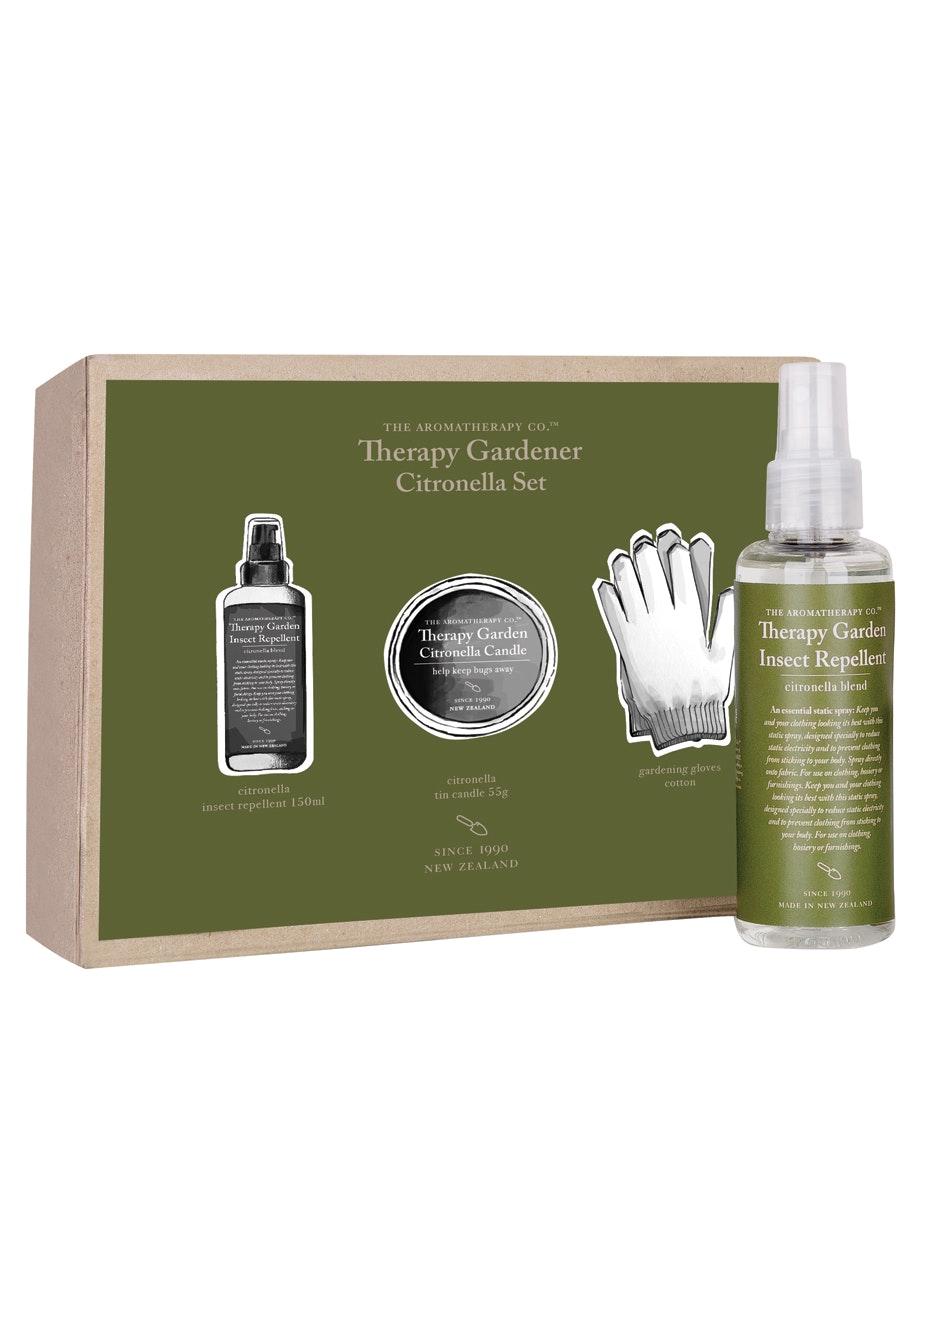 The Aromatherapy Co. Therapy Gardener Gift Set